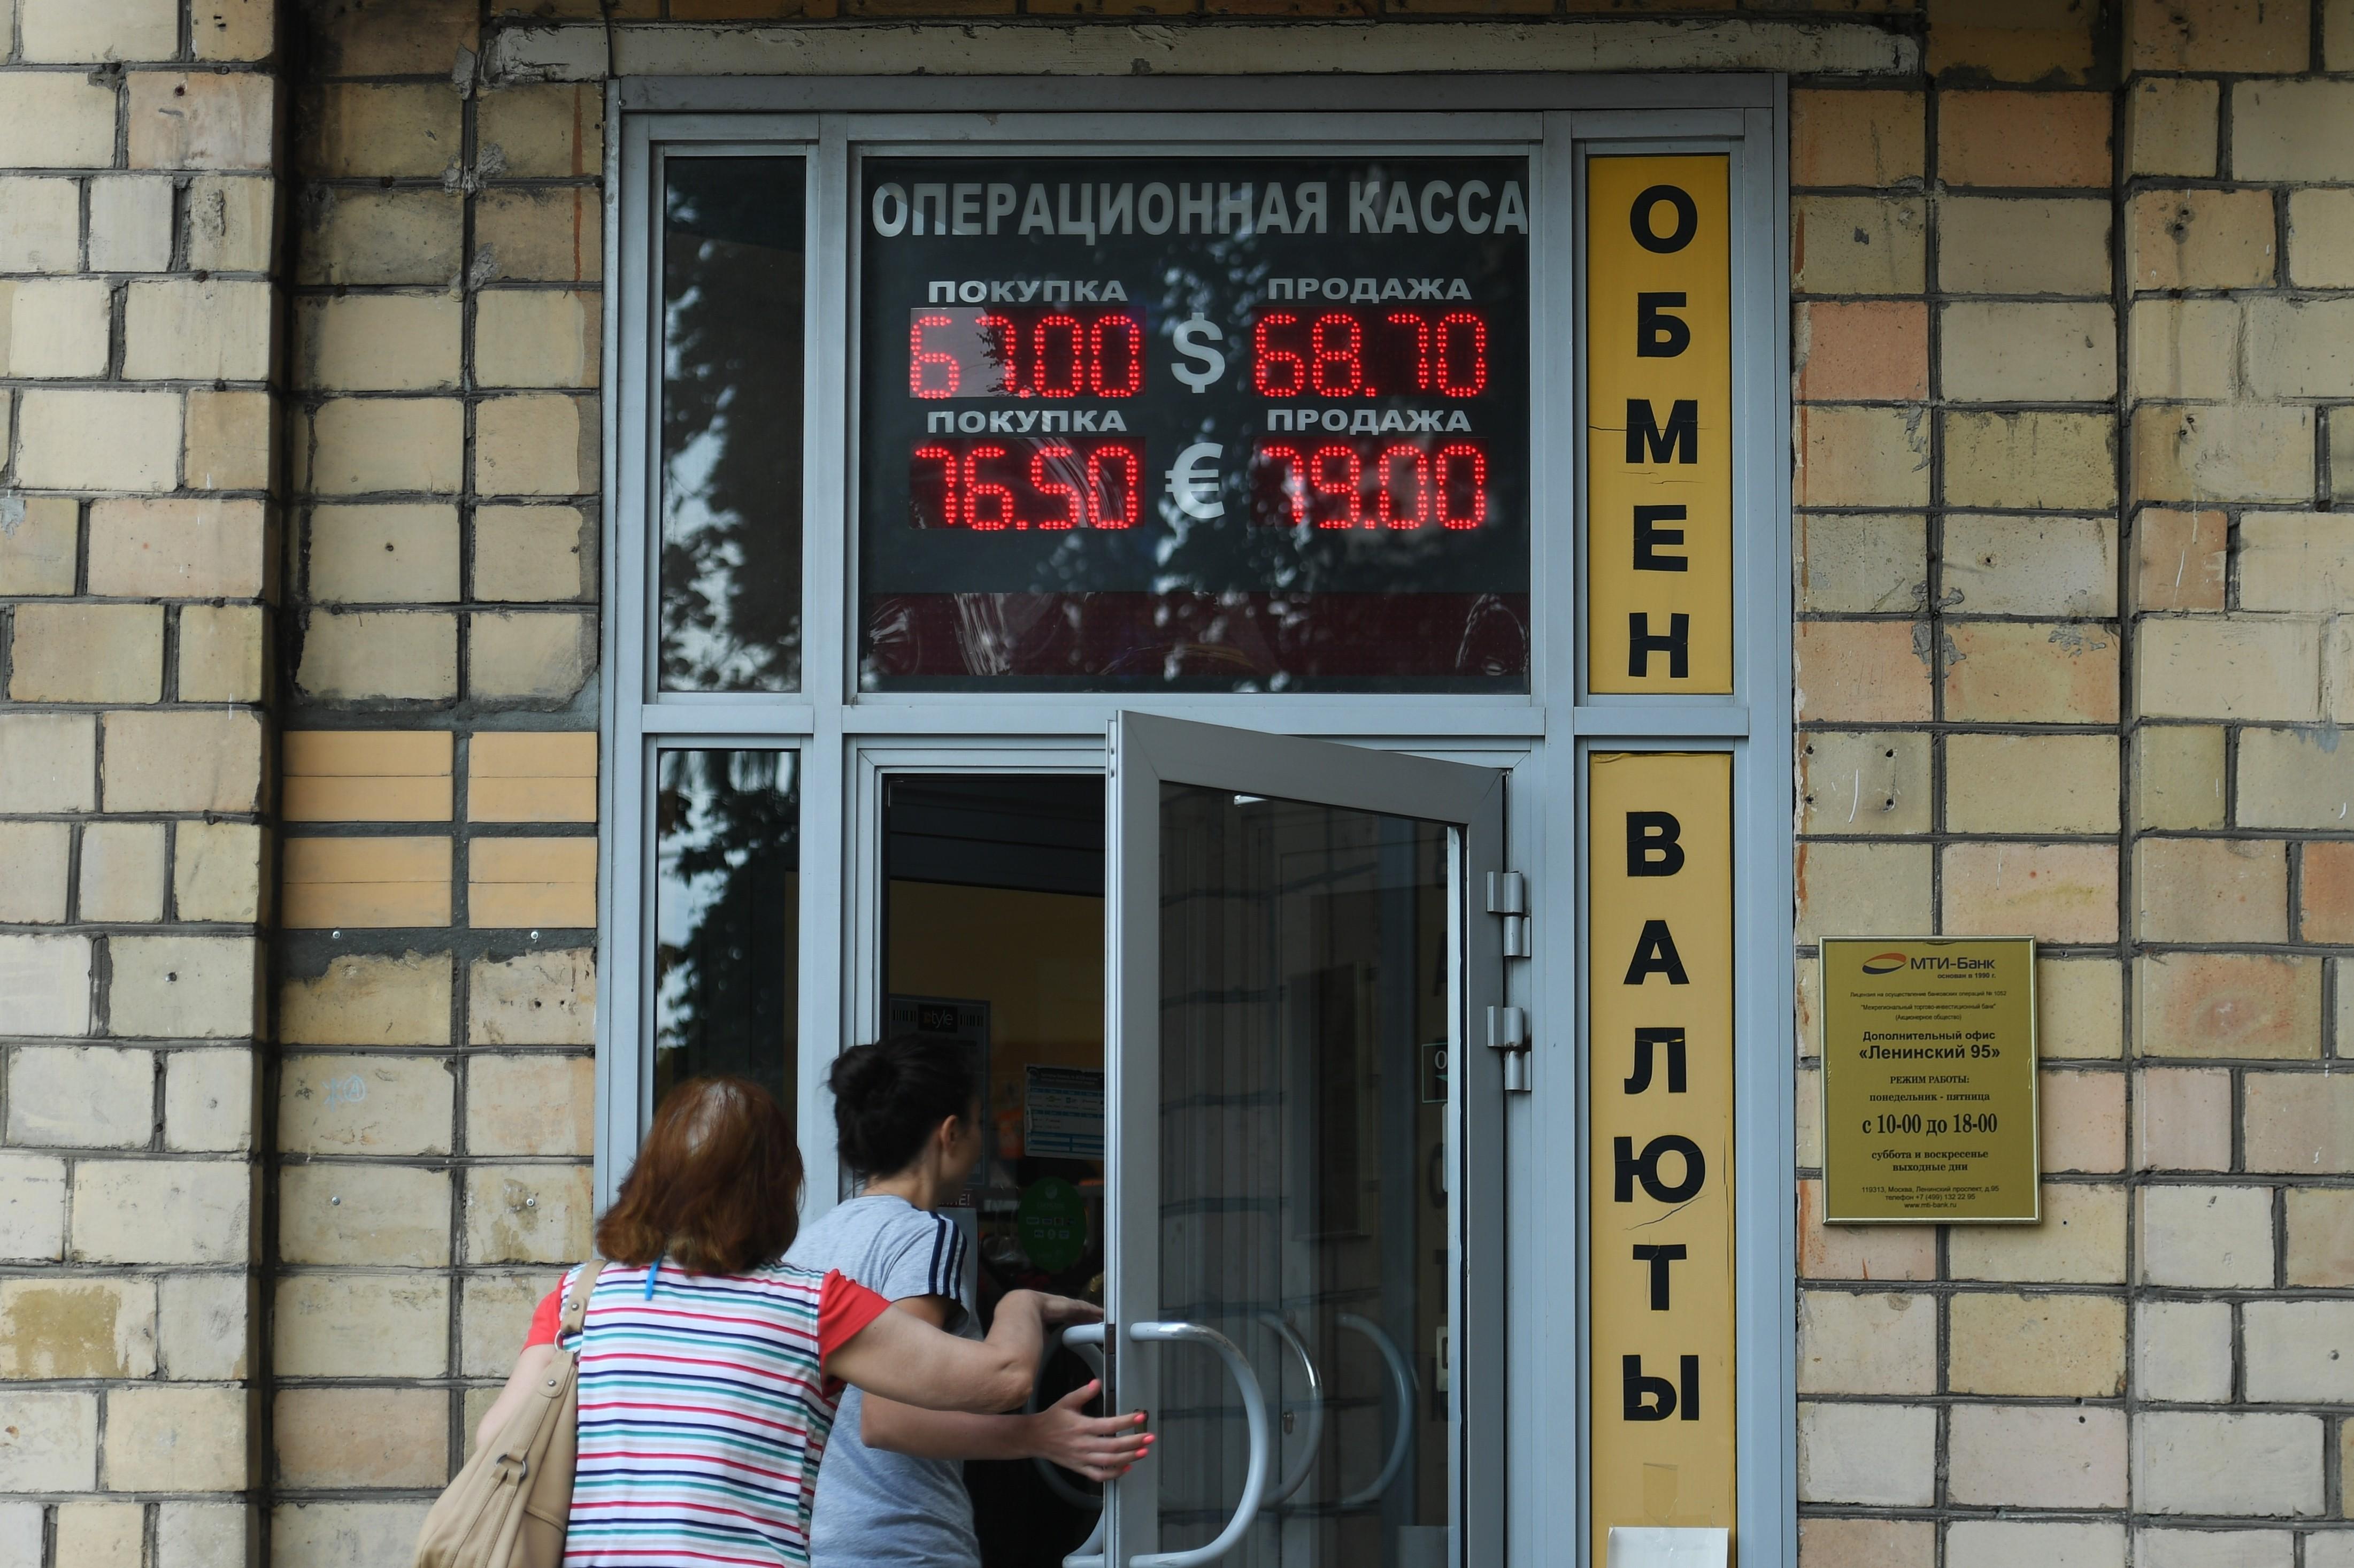 Фото © РИА Новости/Евгений Новоженина